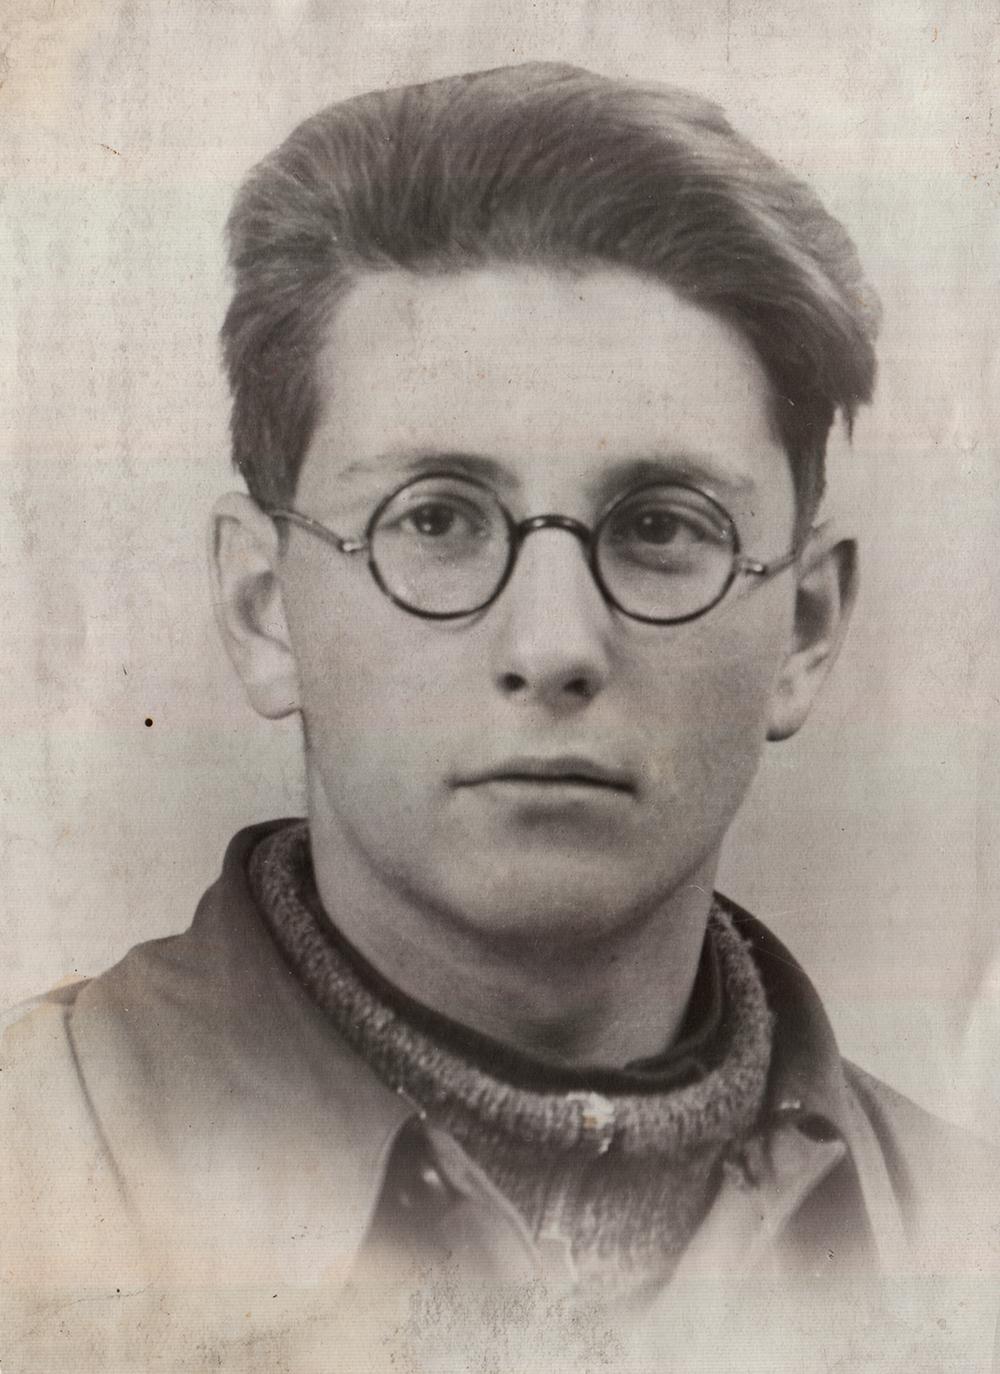 Polyak Leonard. photograph. 1941, Leningrad